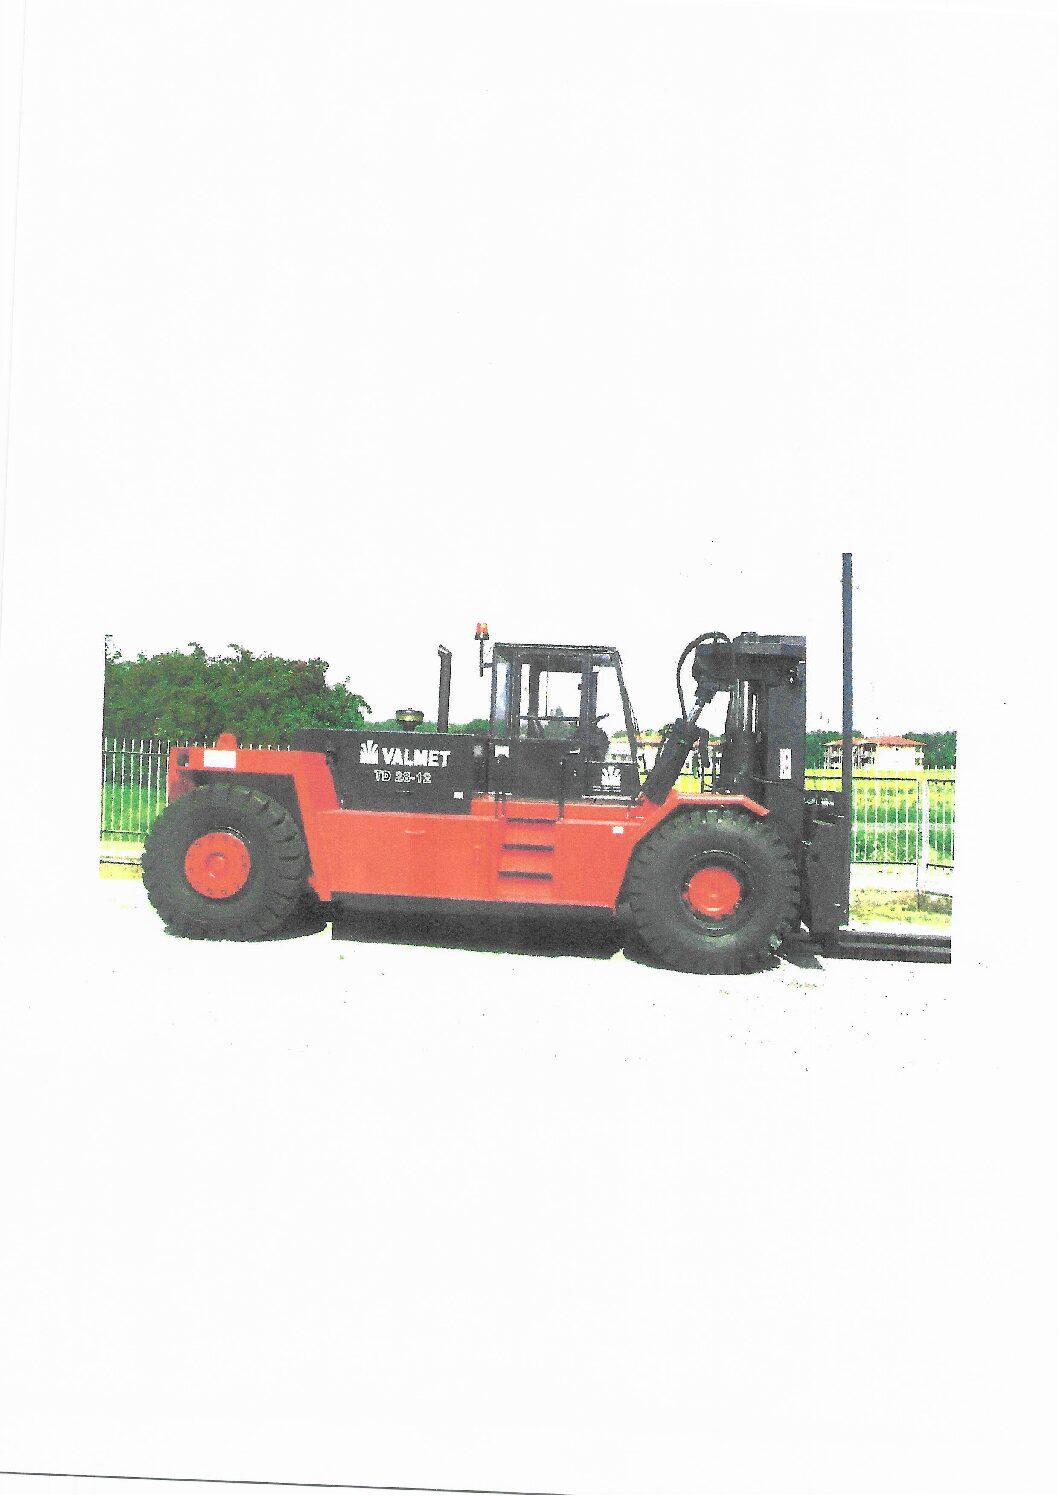 MULETTO USATO DIESEL VALMET TD 2812 RO-RO - Vendita muletti usati,vendita e noleggio muletto usato elettrico e benzina